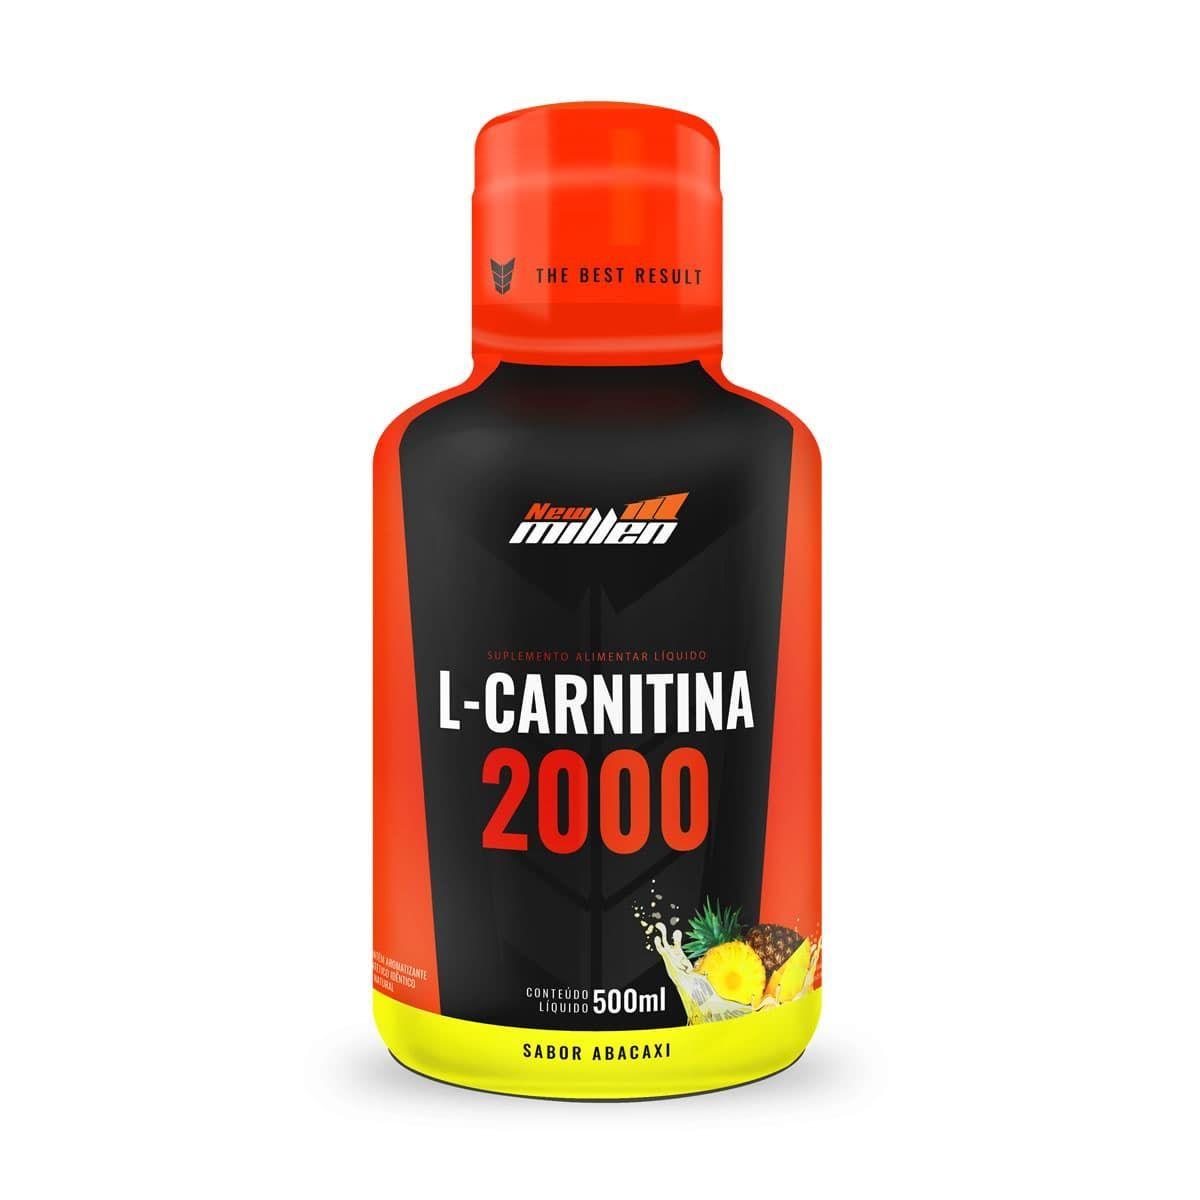 L-CARNITINA 2000MG ABACAXI NEW MILLEN